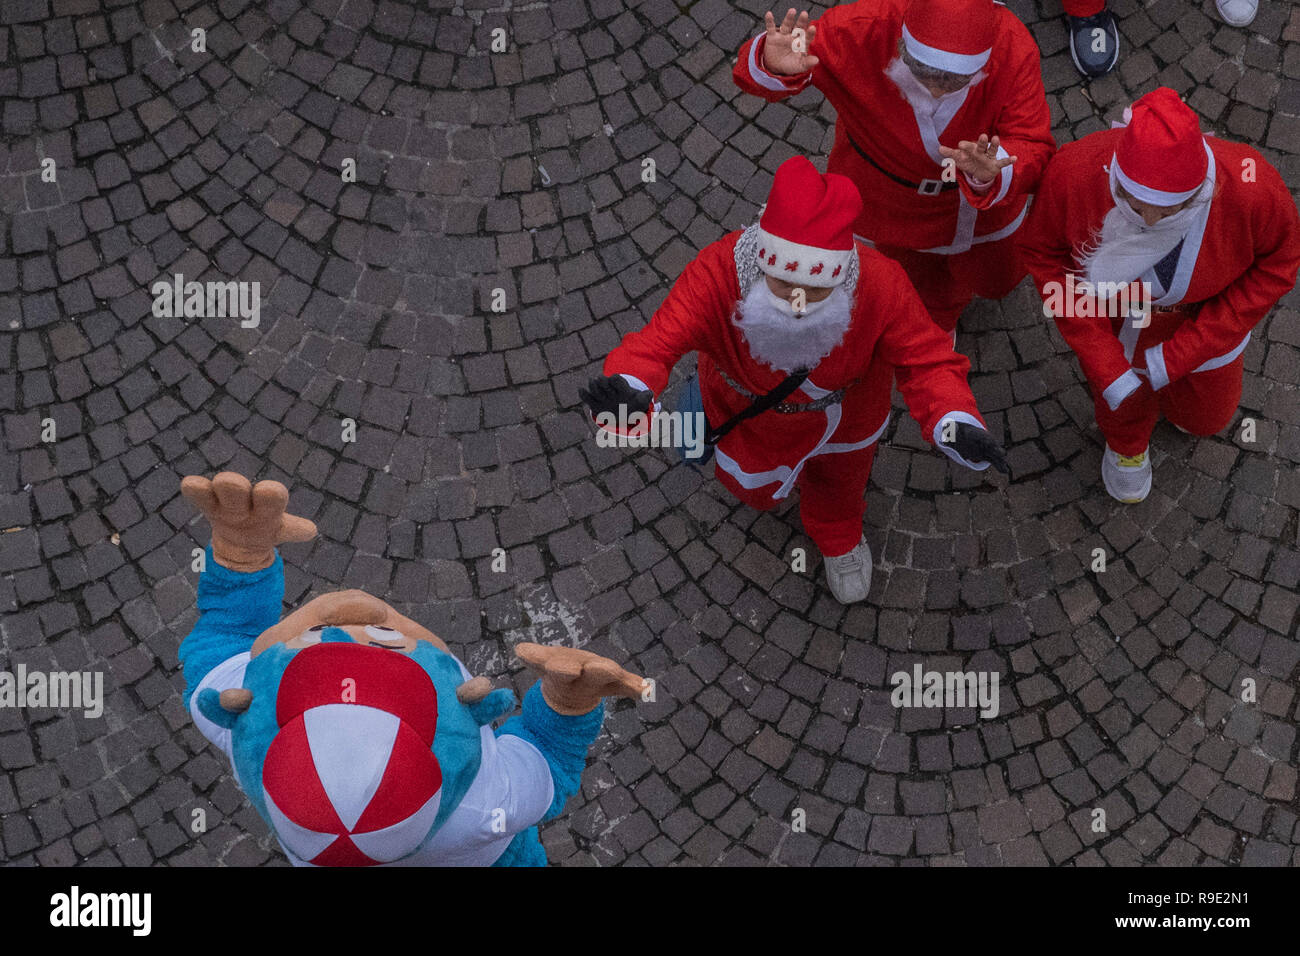 Noale, Italy. 23rd December, 2018. 10th Santa Claus Run in Noale Credit: Awakening Photo Agency/Alamy Live News - Stock Image